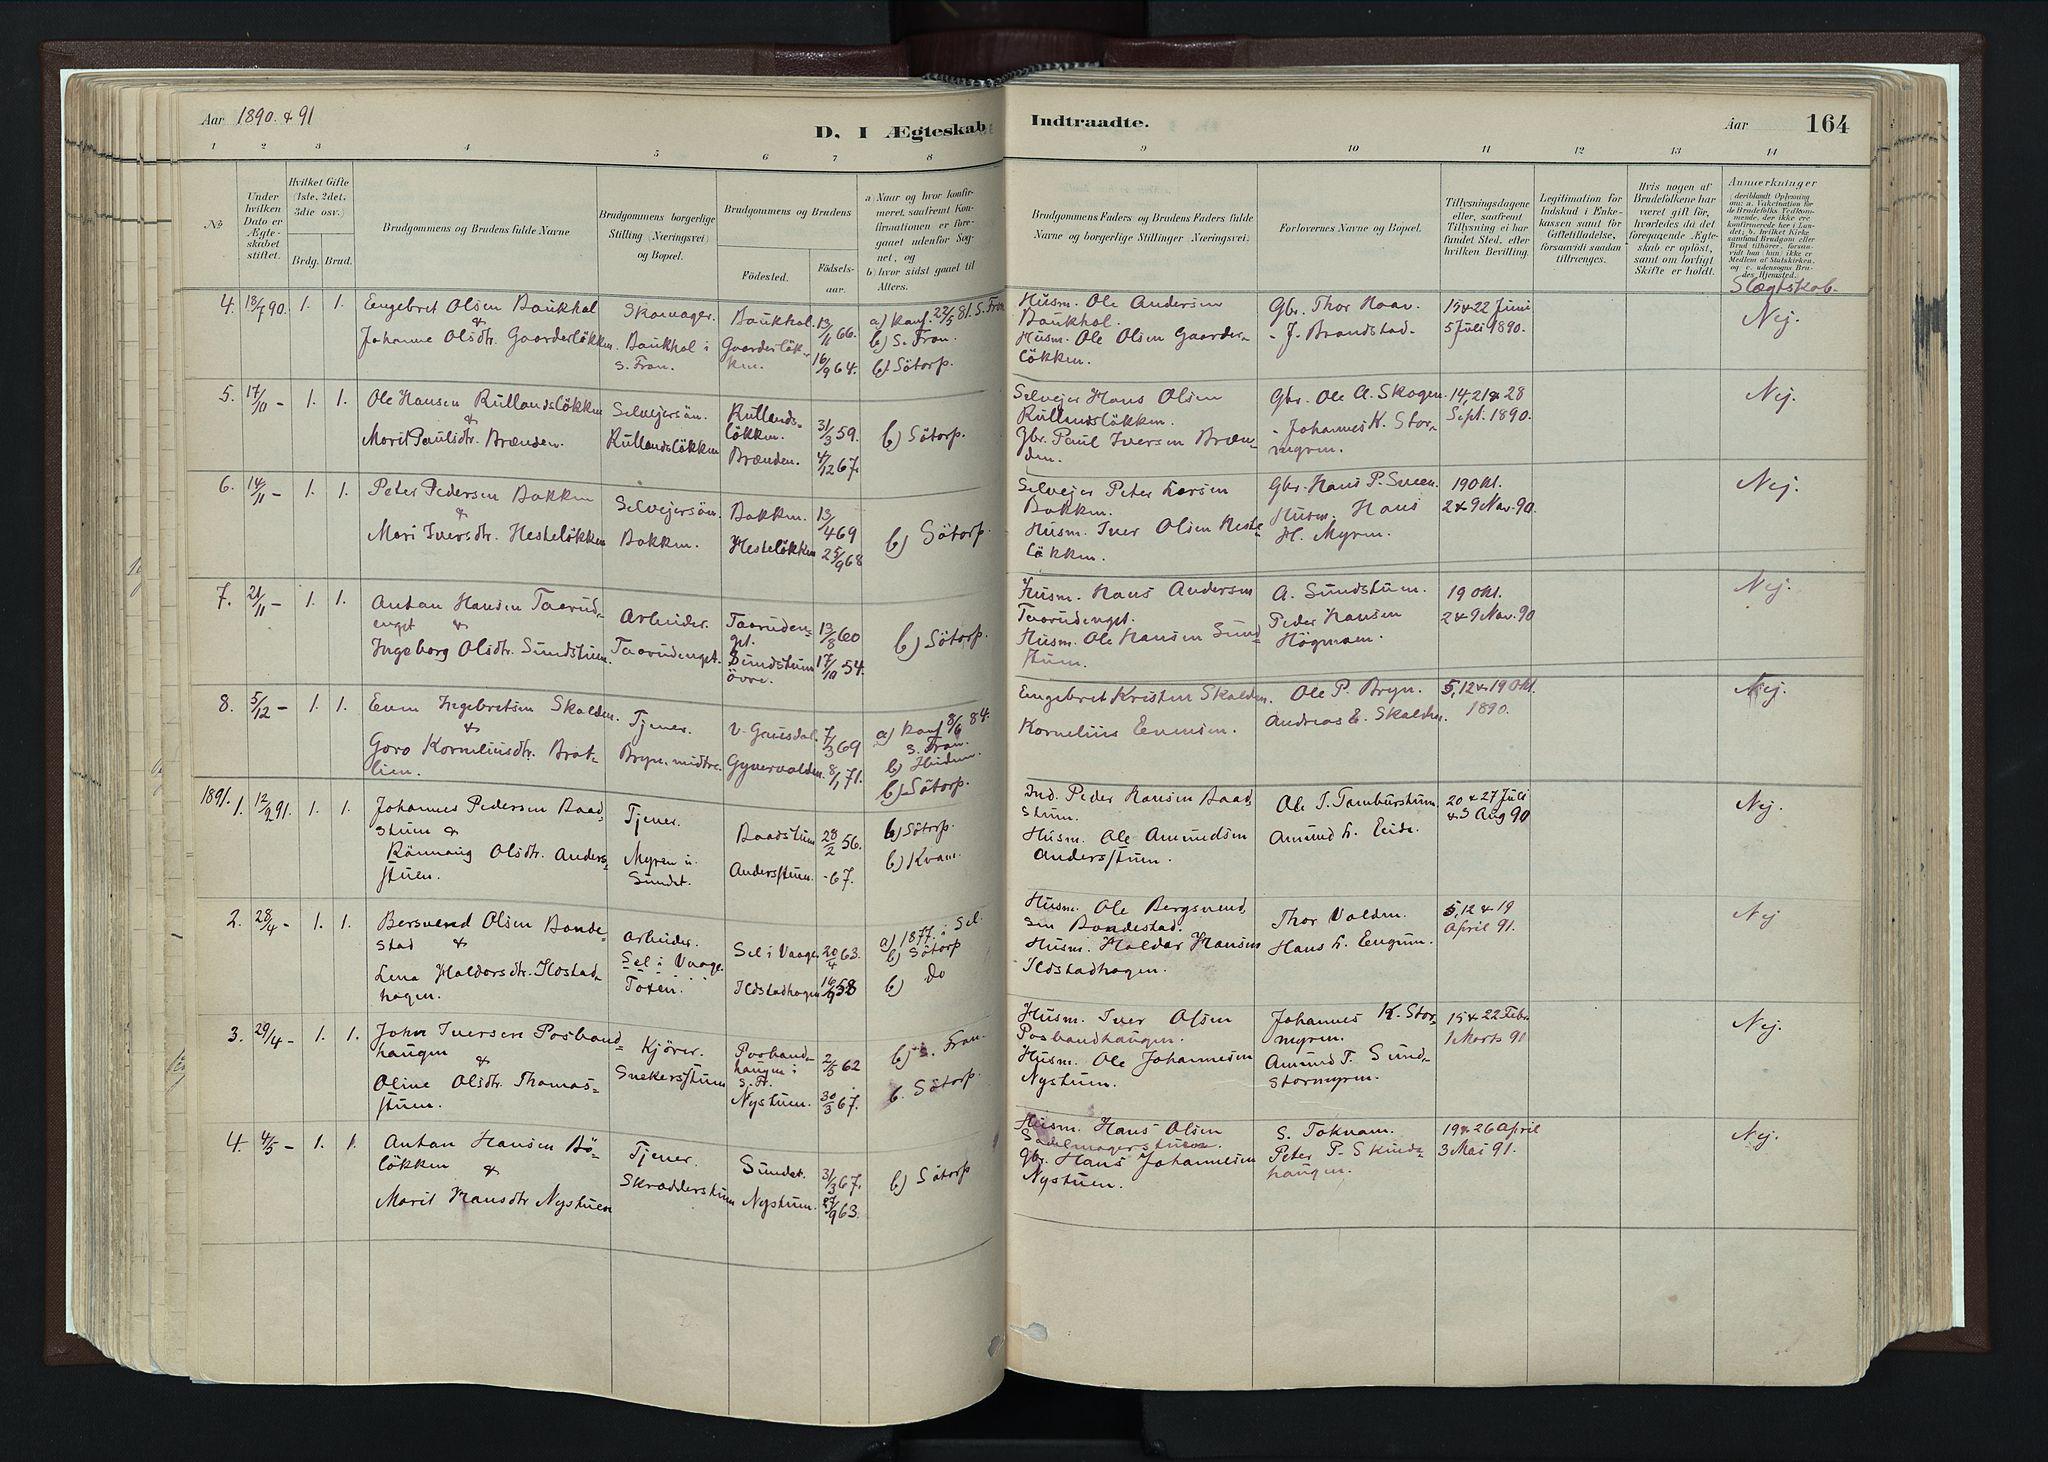 SAH, Nord-Fron prestekontor, Ministerialbok nr. 4, 1884-1914, s. 164